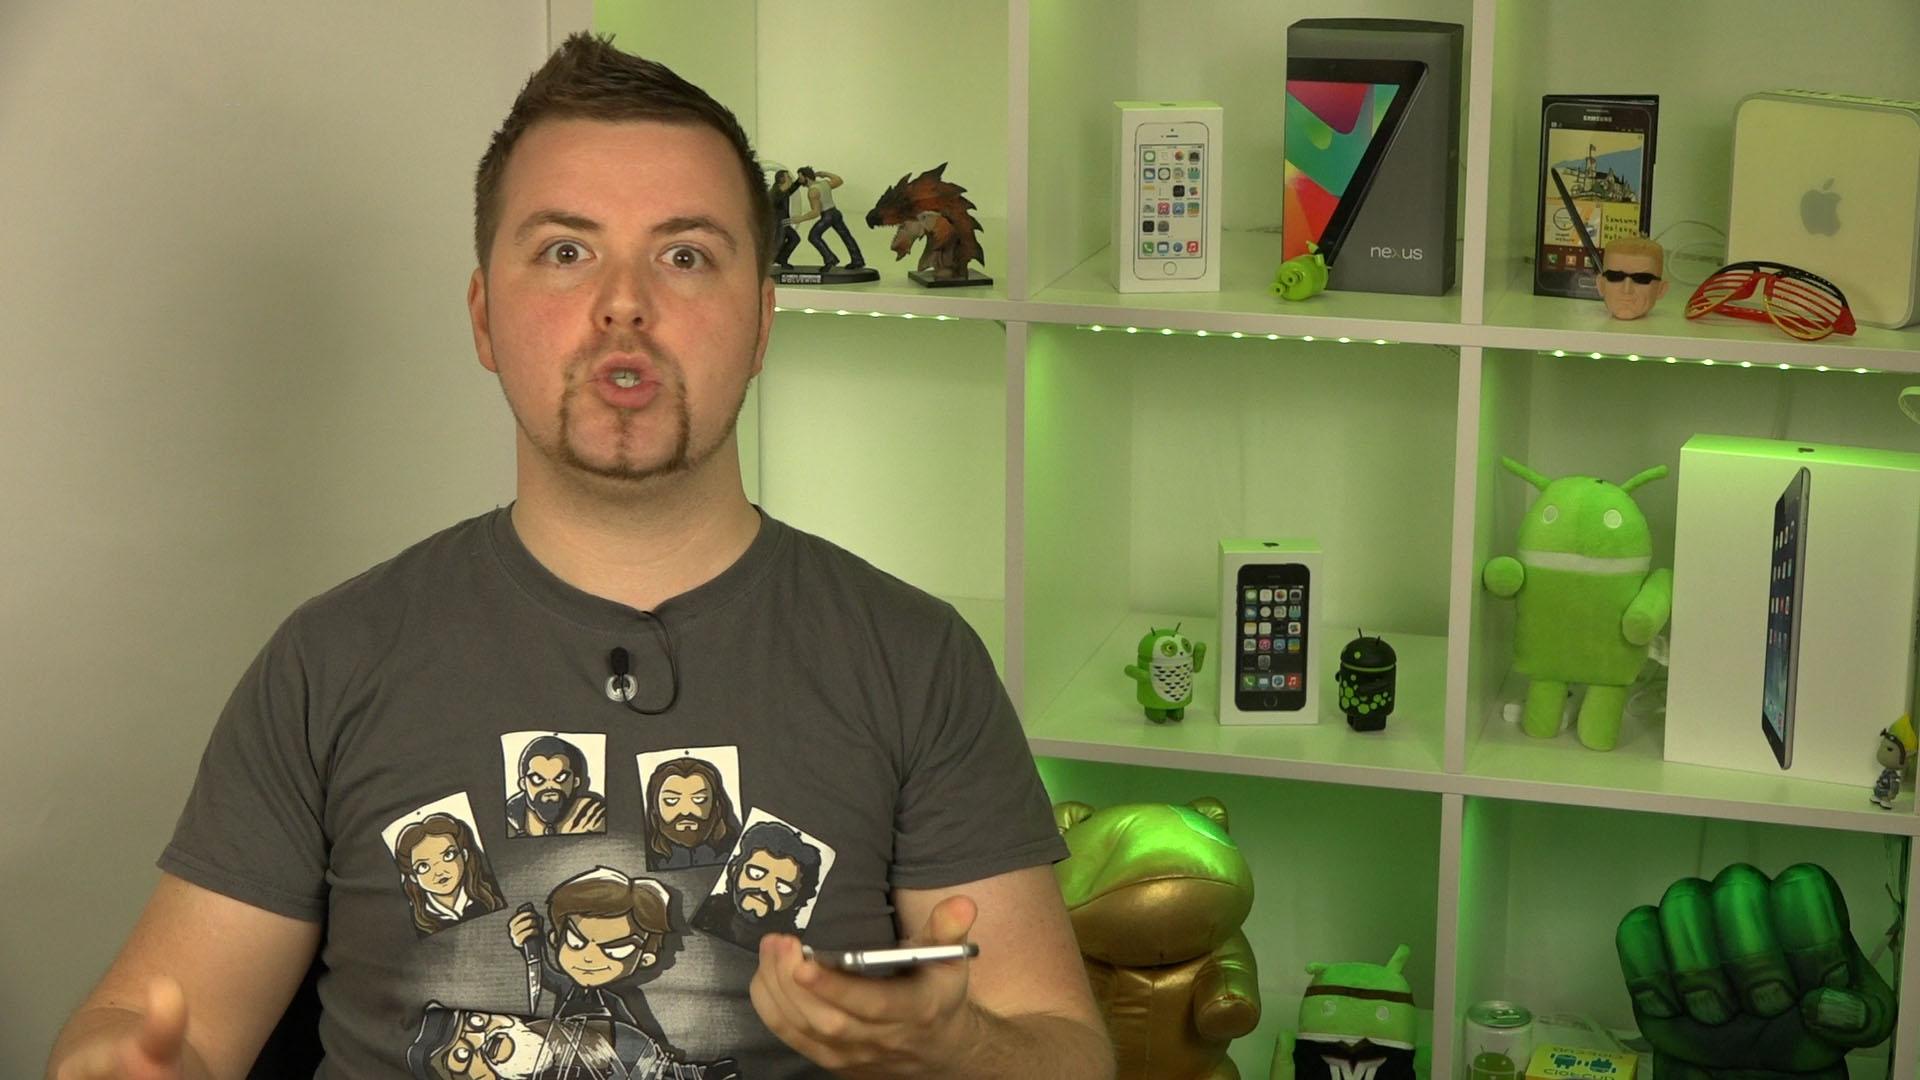 WhatsApp Calls speichert Anrufe: Shitstorm-Kommentar